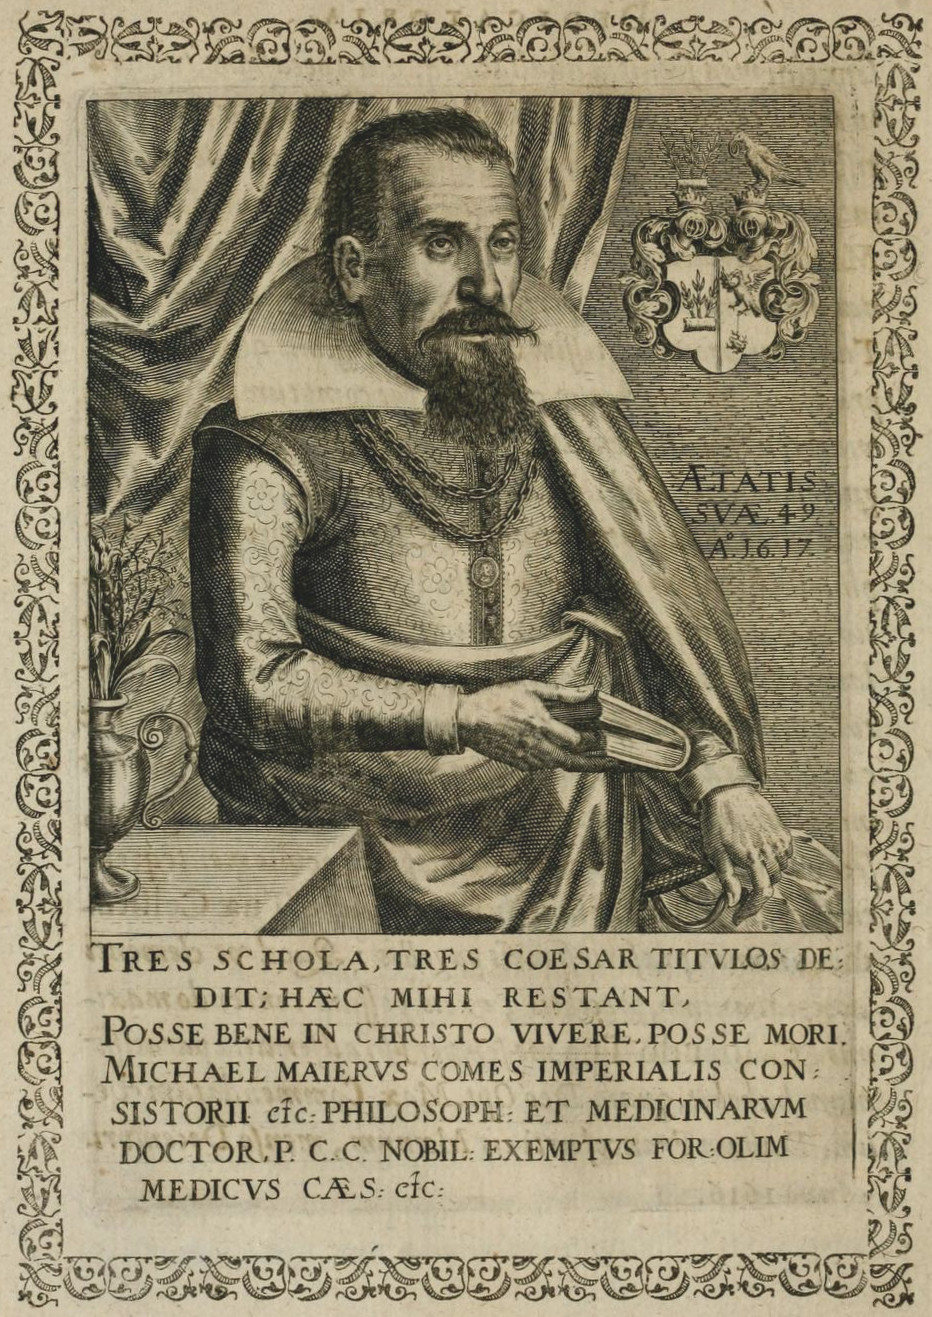 Copper engraving of Michael Maier, from ''Symbola avreae mensae dvodecim nationvm''. ([[Matthäus Merian]], 1617)